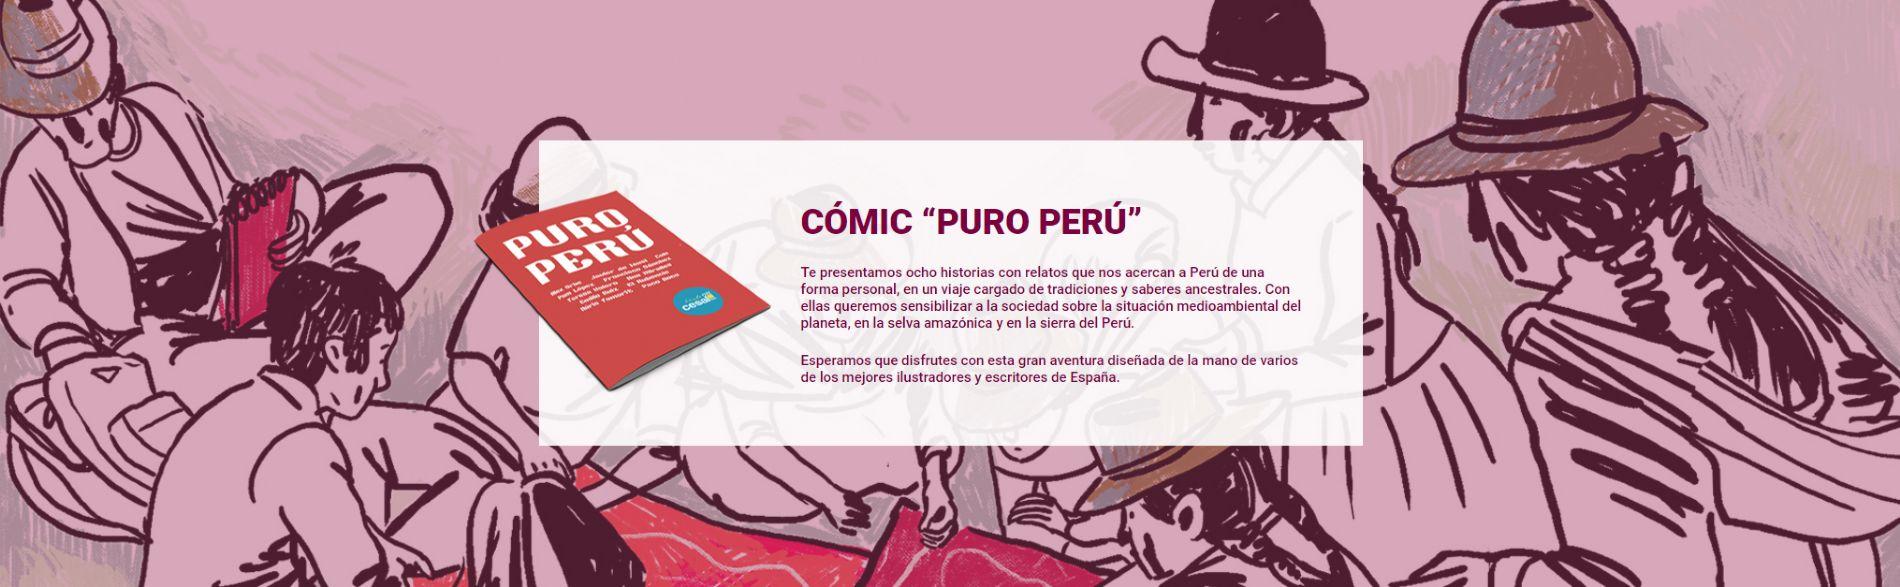 Comic Puro Perú